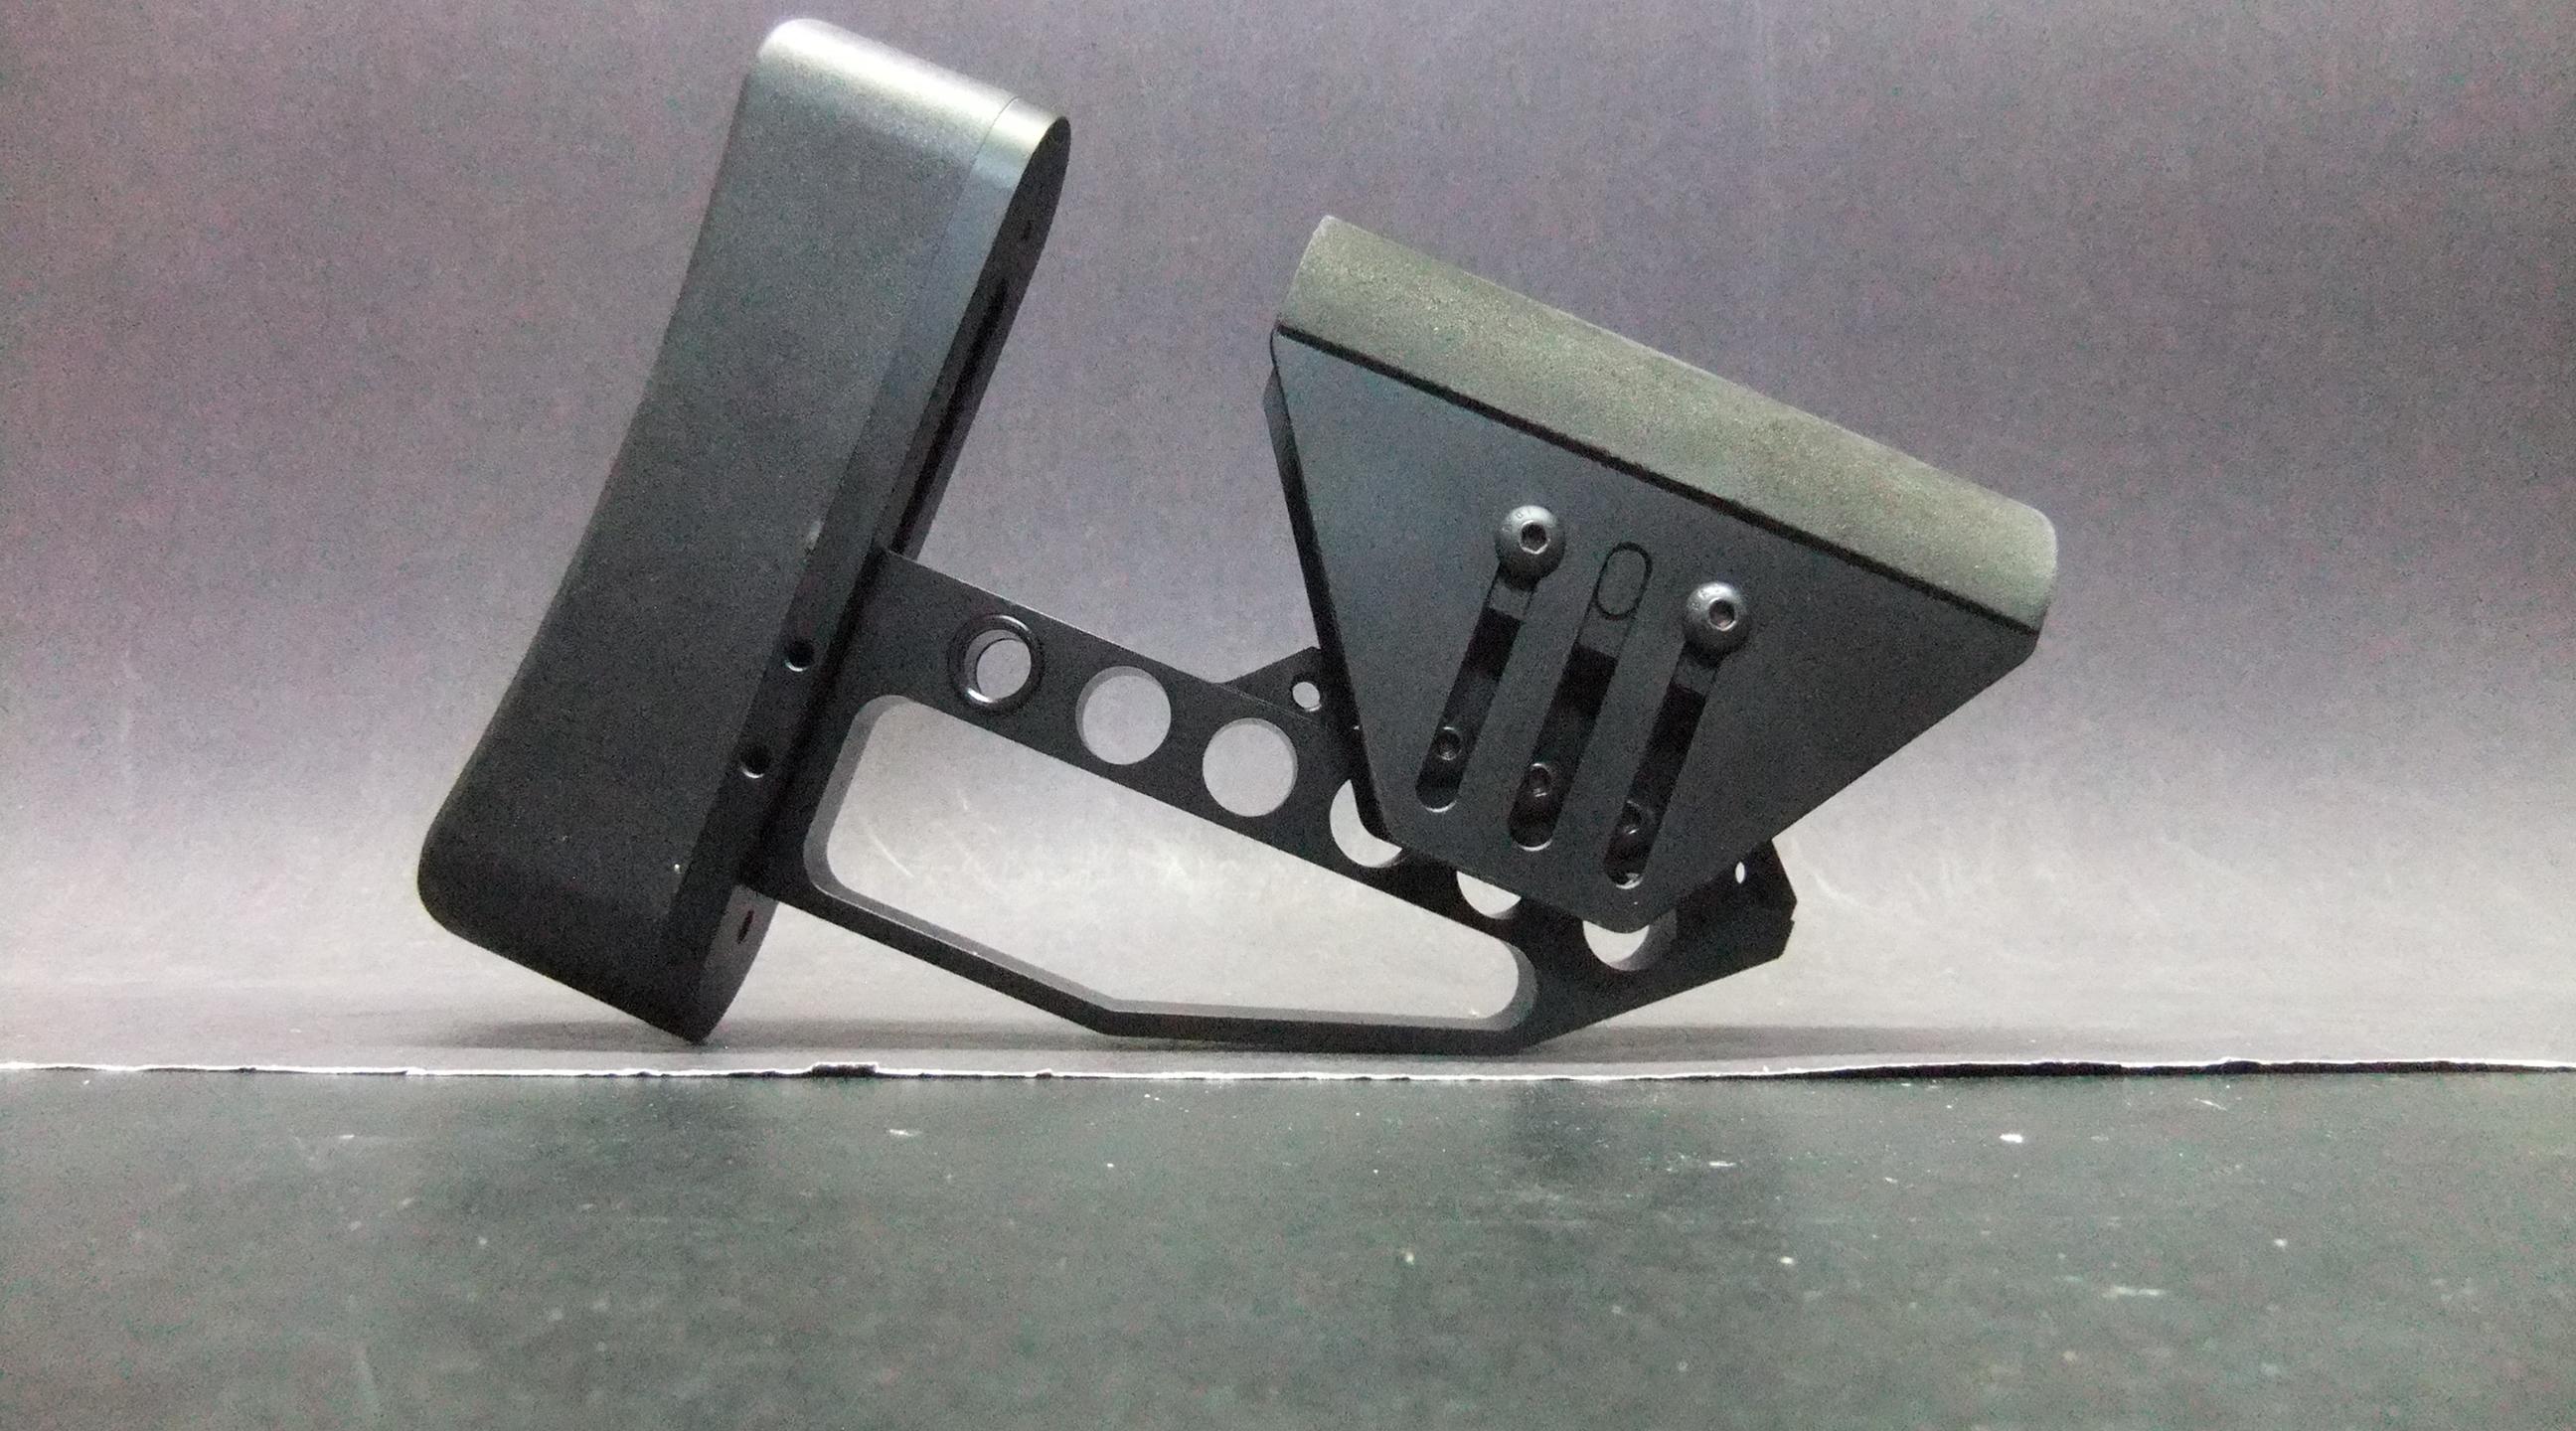 AR15 AR10 Tactical Aluminum Skeleton Minimalist Adjustable Butt Stock Cheek  Rest Buttstock [AB]